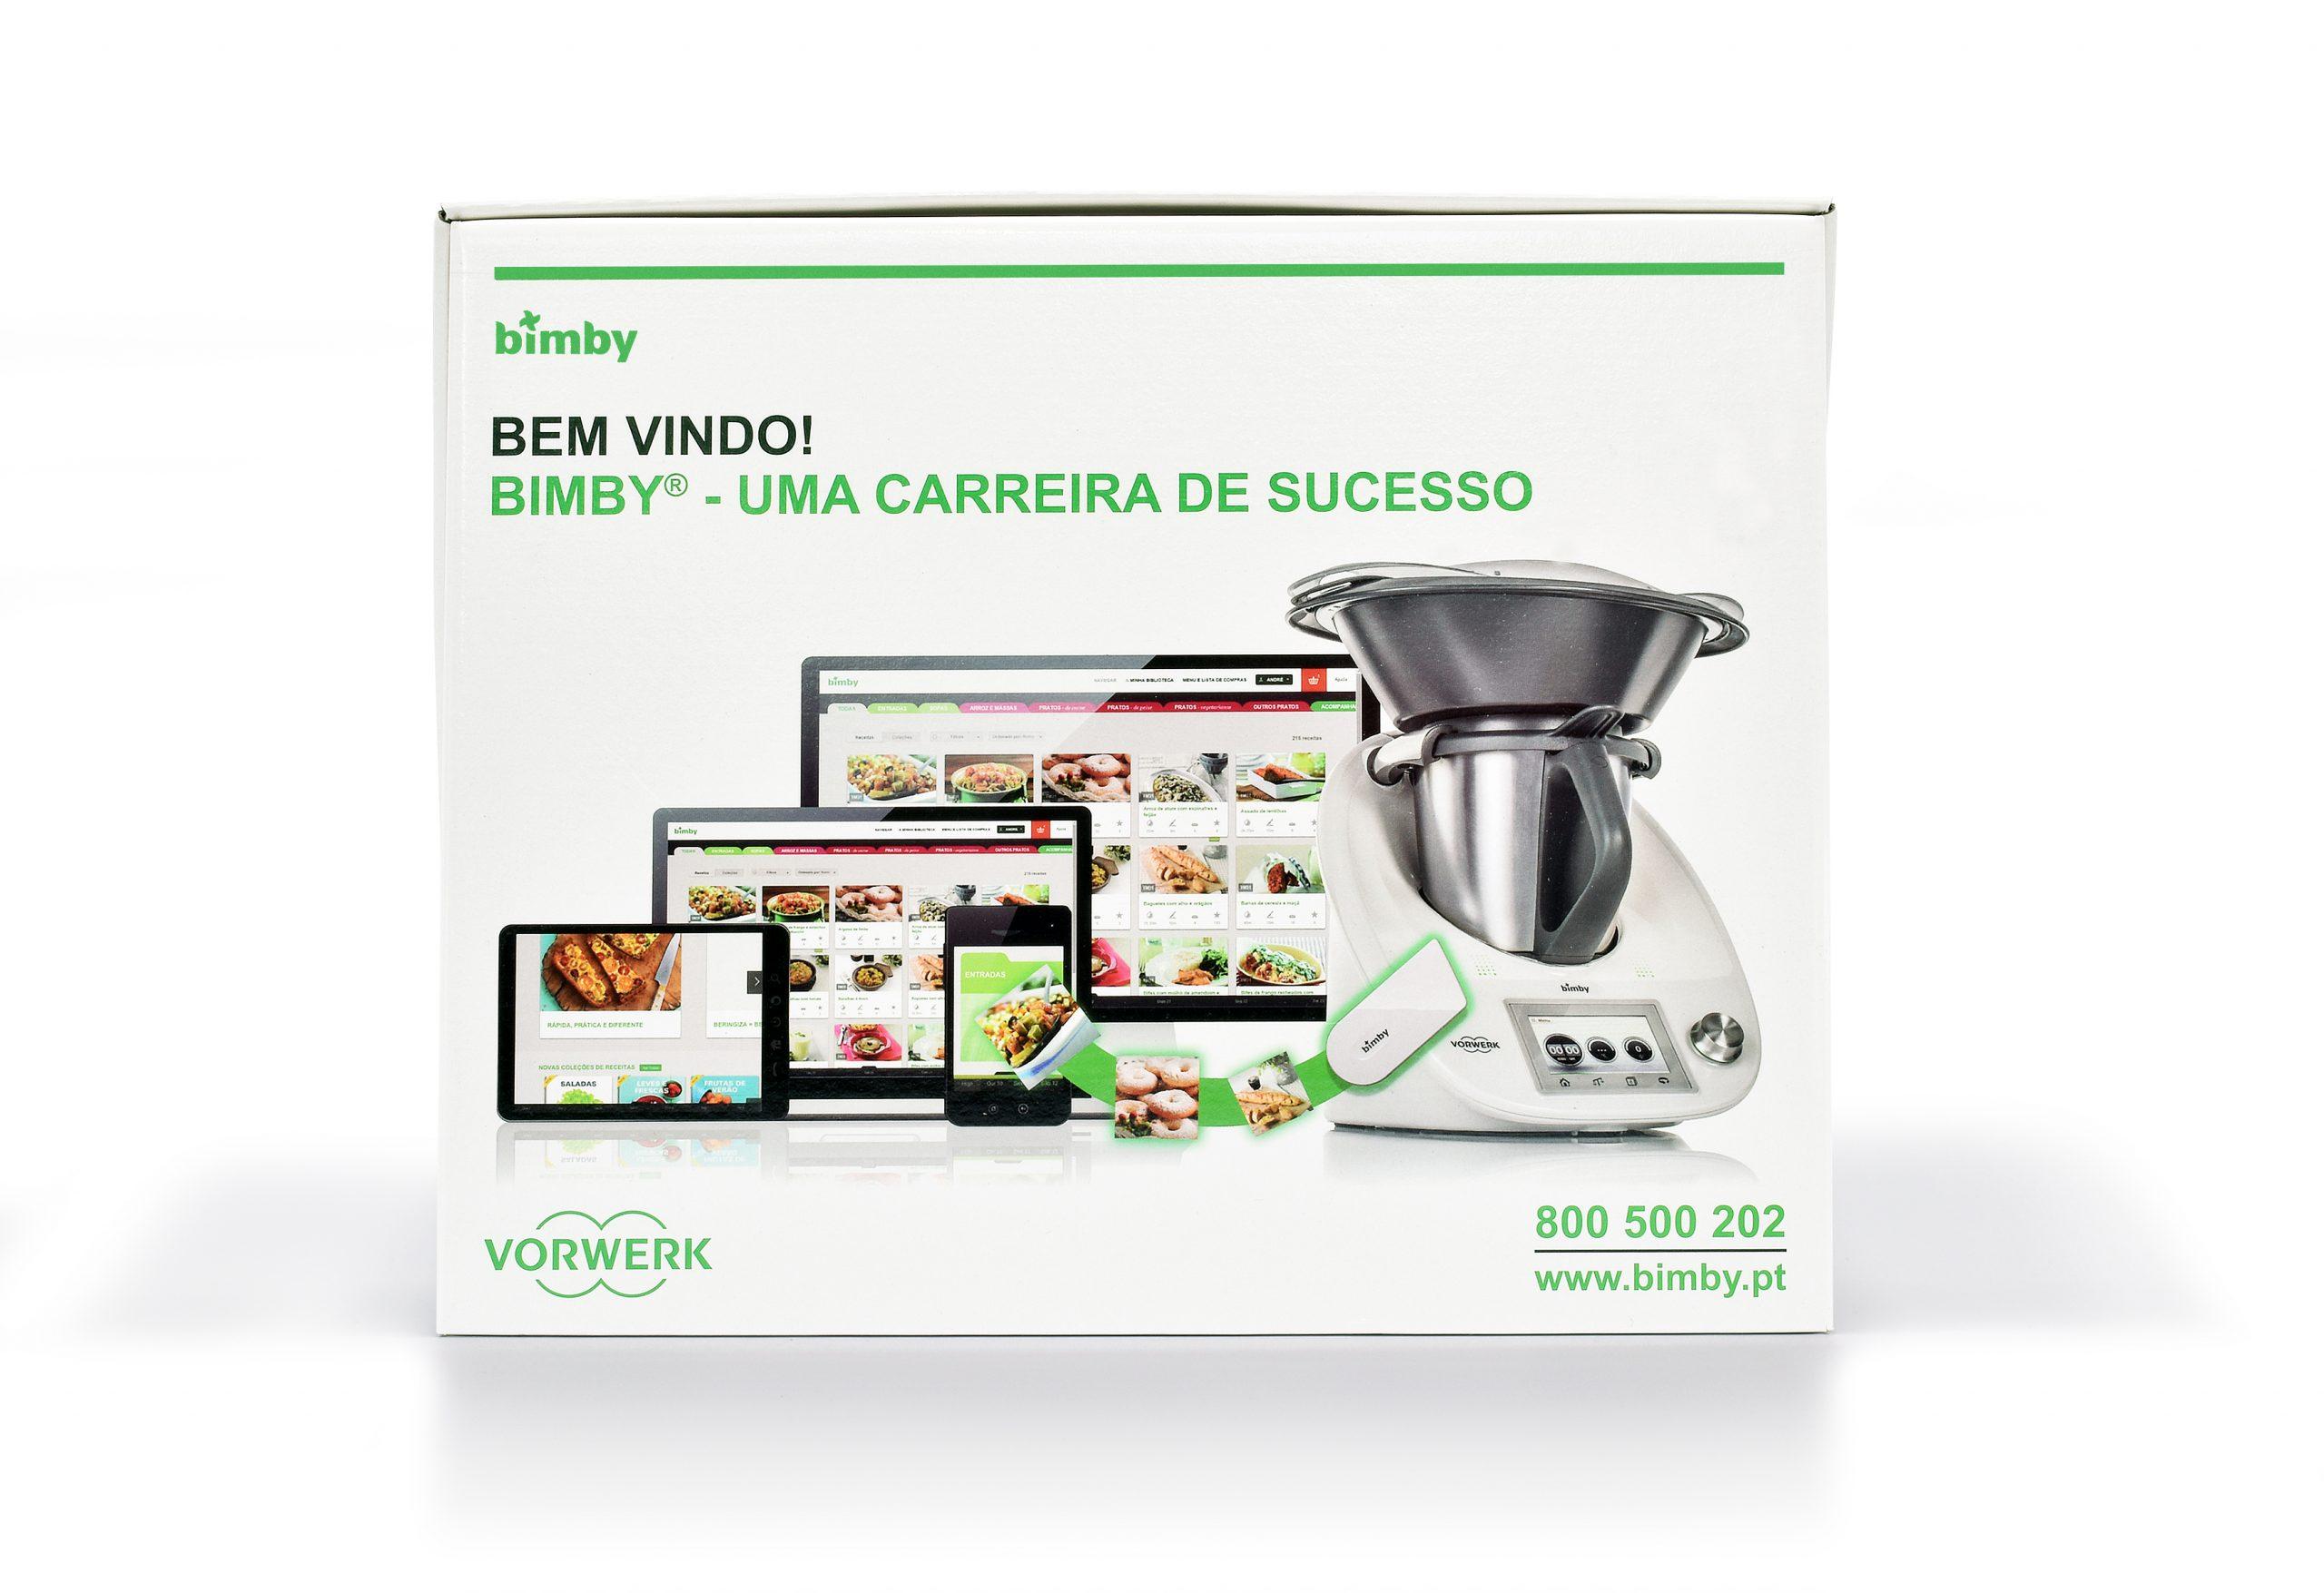 Bimby_embalagem_com_pega